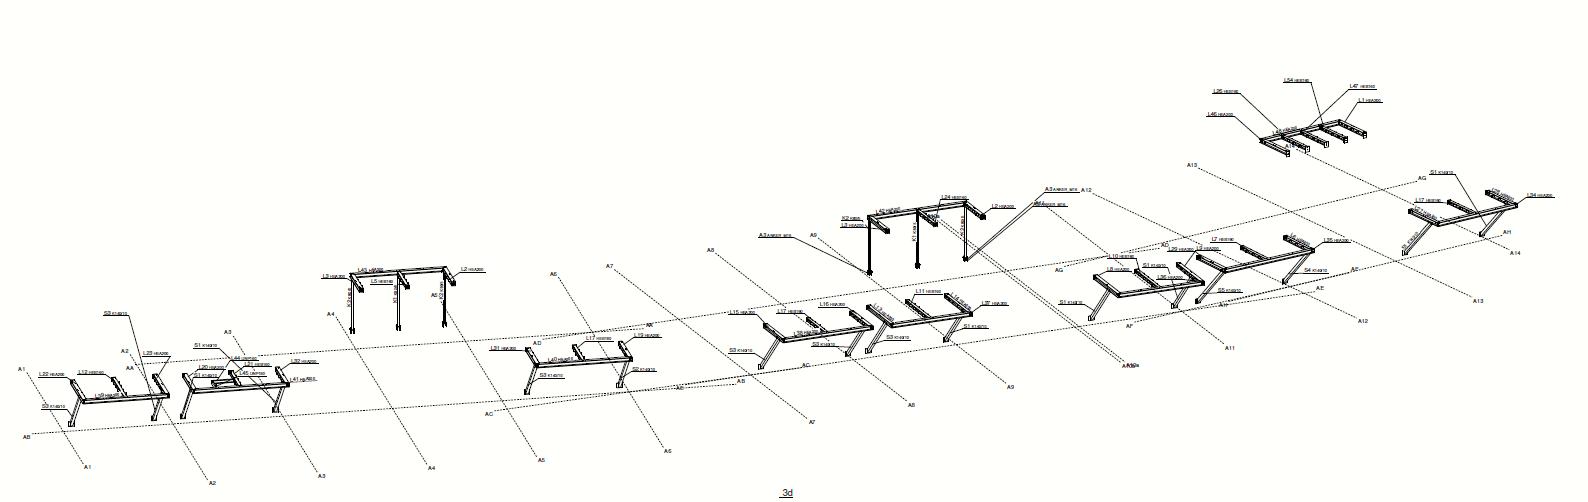 AcroRd32_rVGEki6Vwh